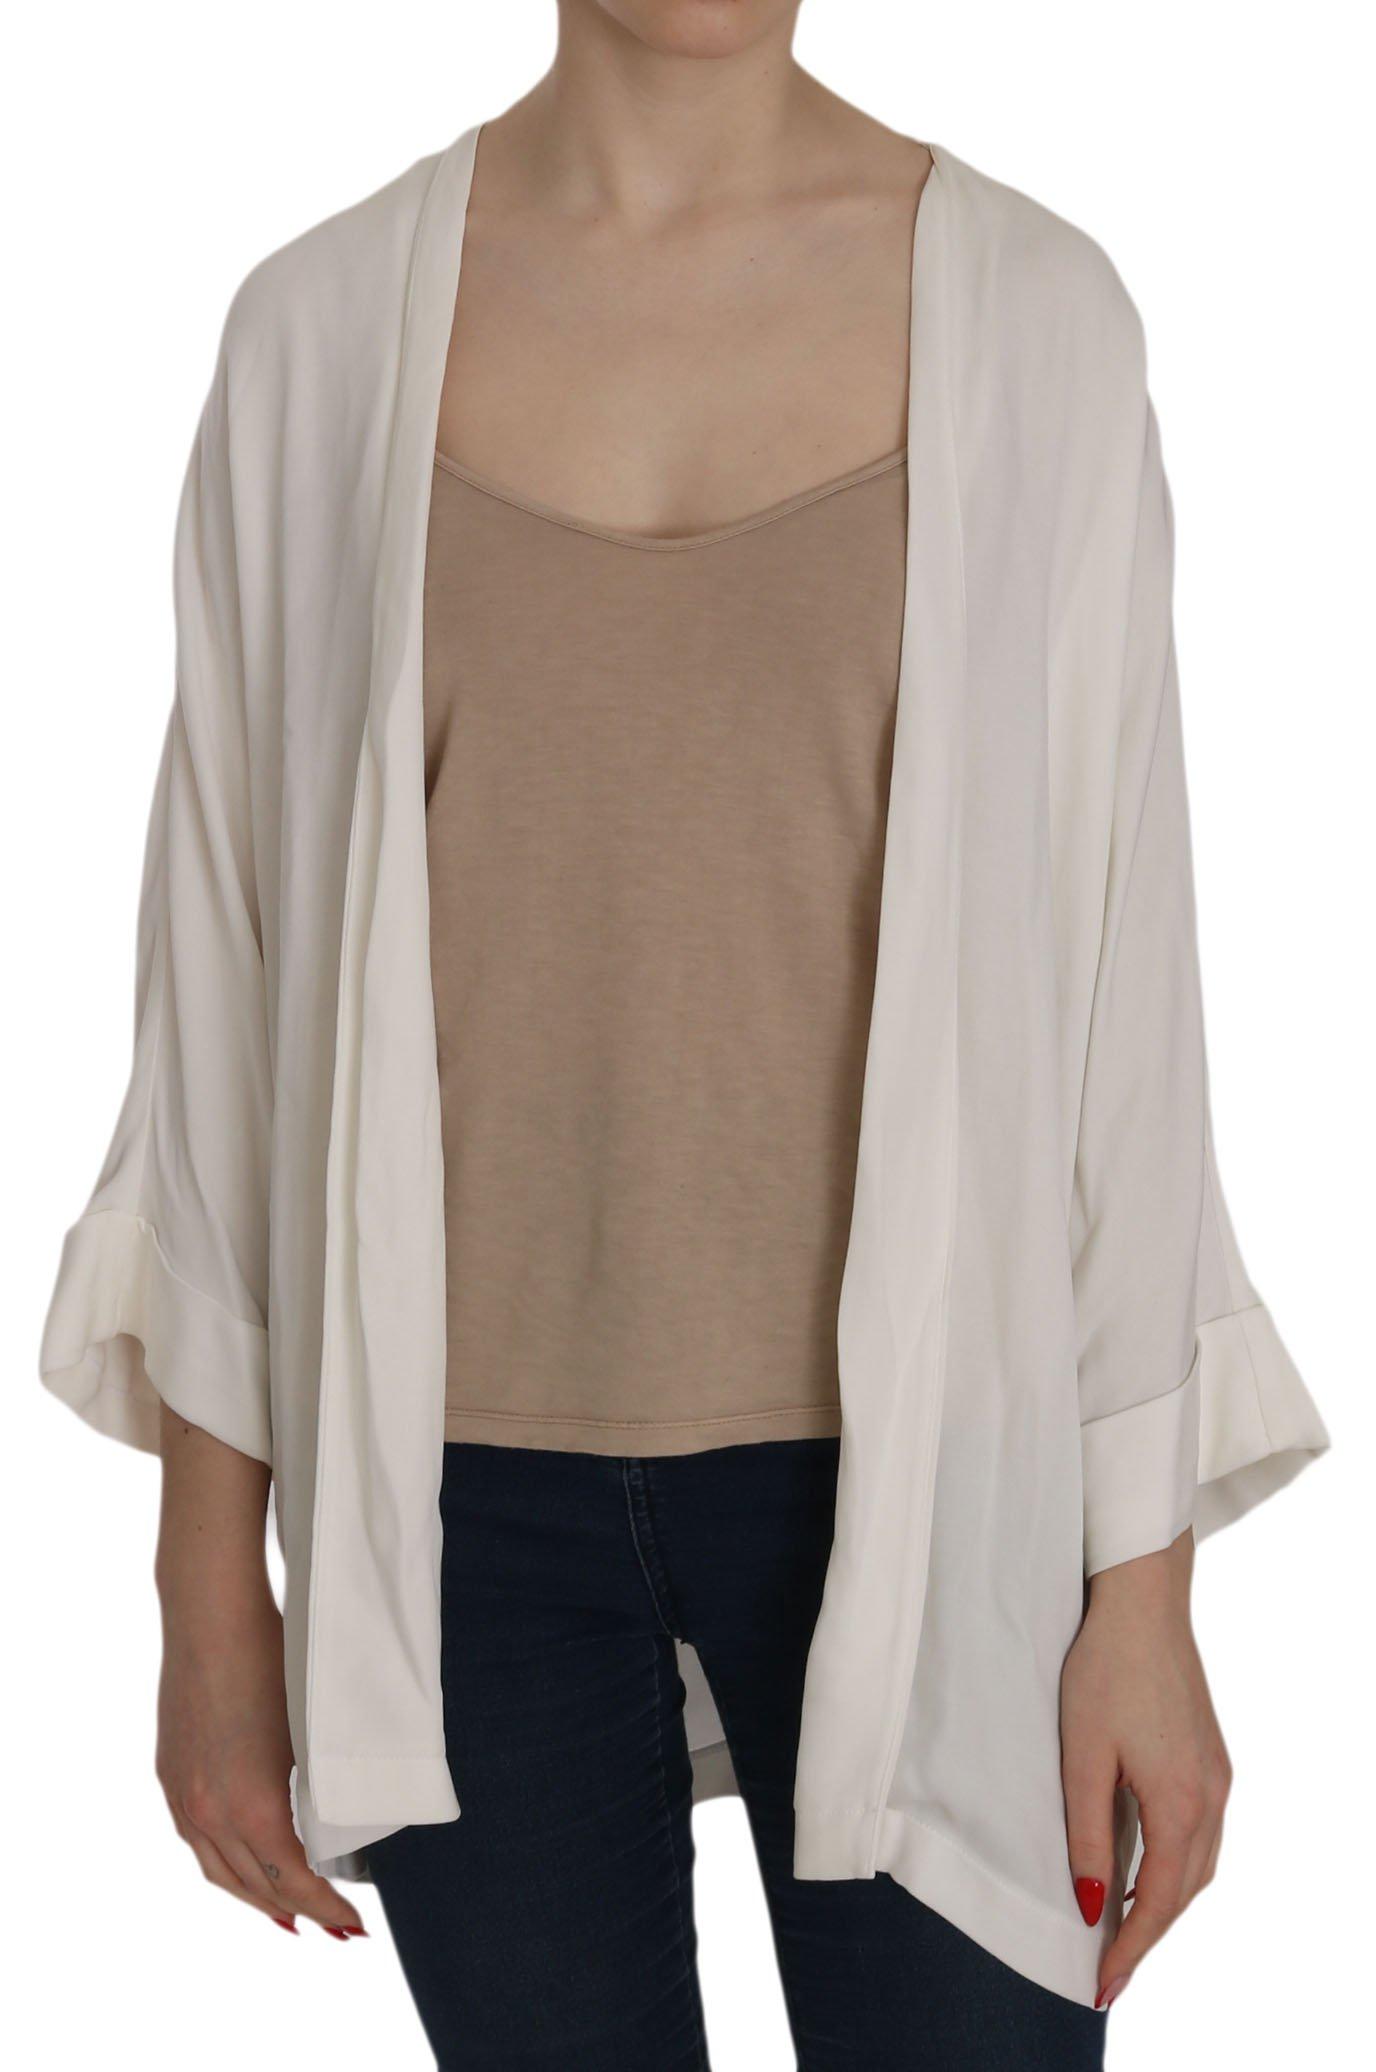 PINKO Women's Folded LS Deep Neck Top Grey TSH3730 - IT38|XS